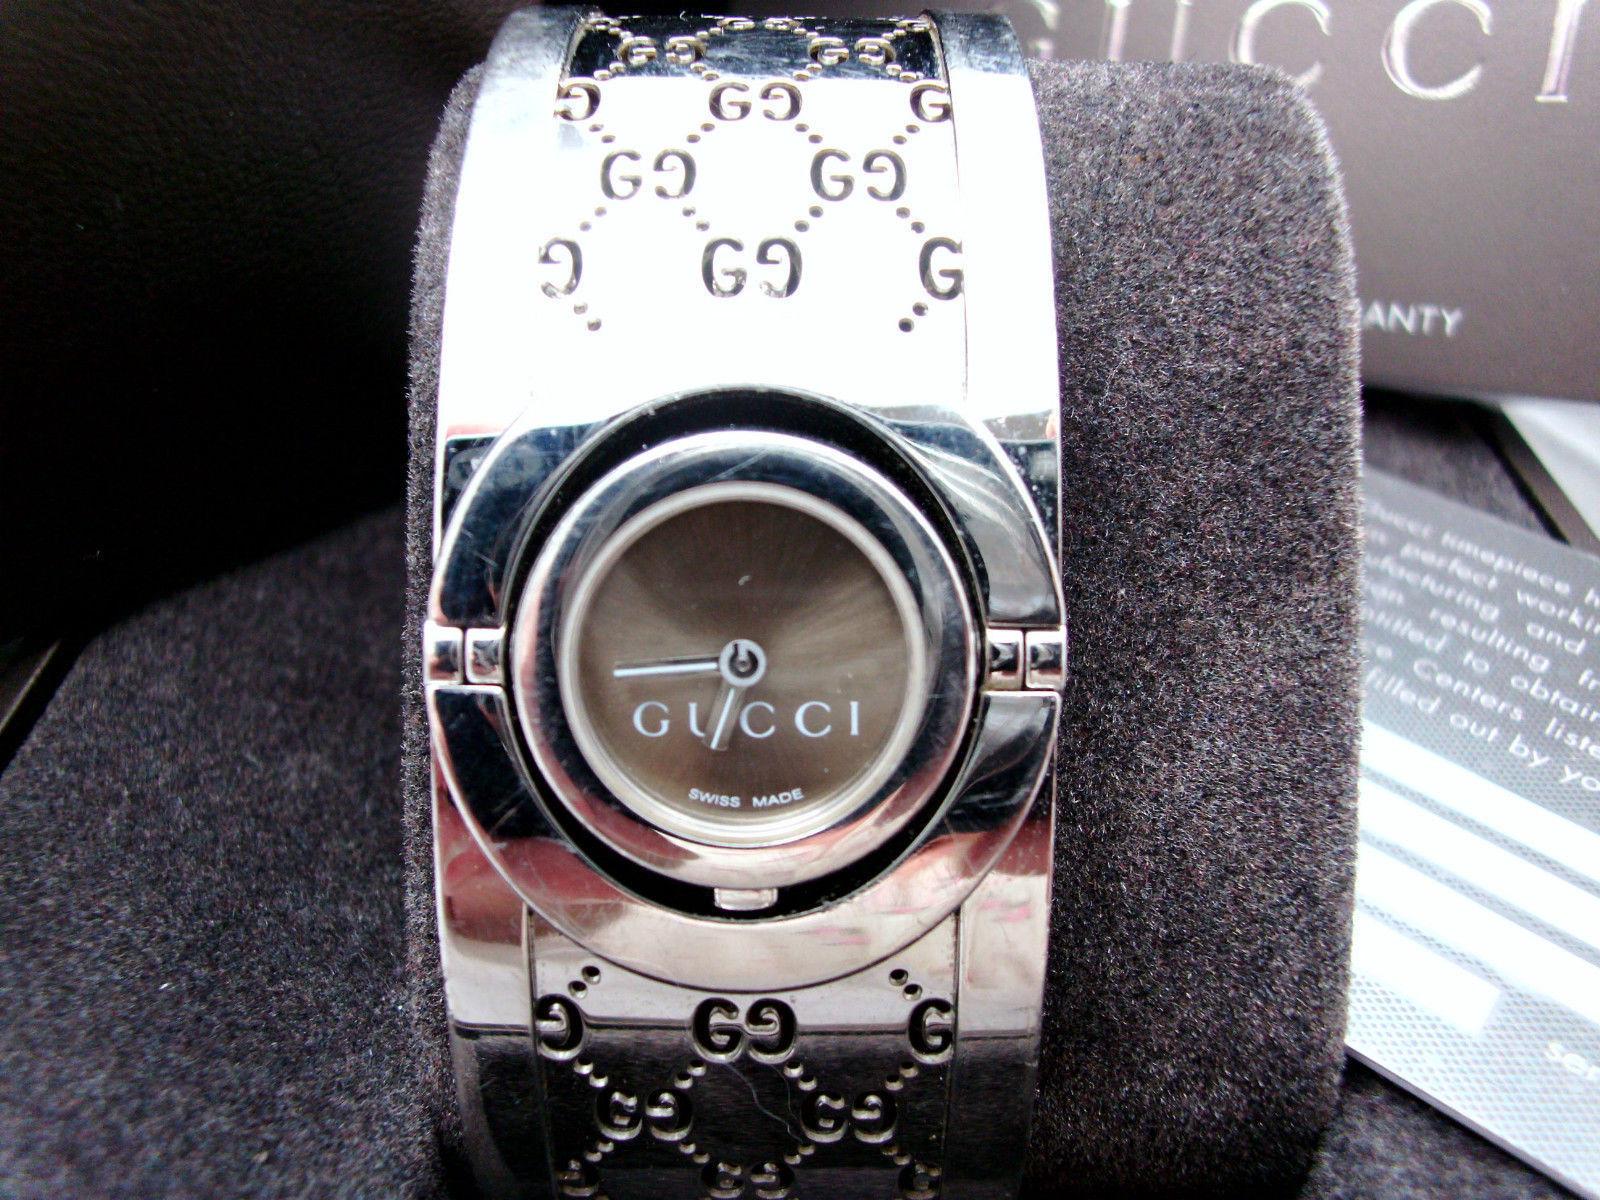 4717434f850 Gucci Twirl Watch 112 Brown Guccissima Stainless Bangle Cuff Bracelet w All  EUC